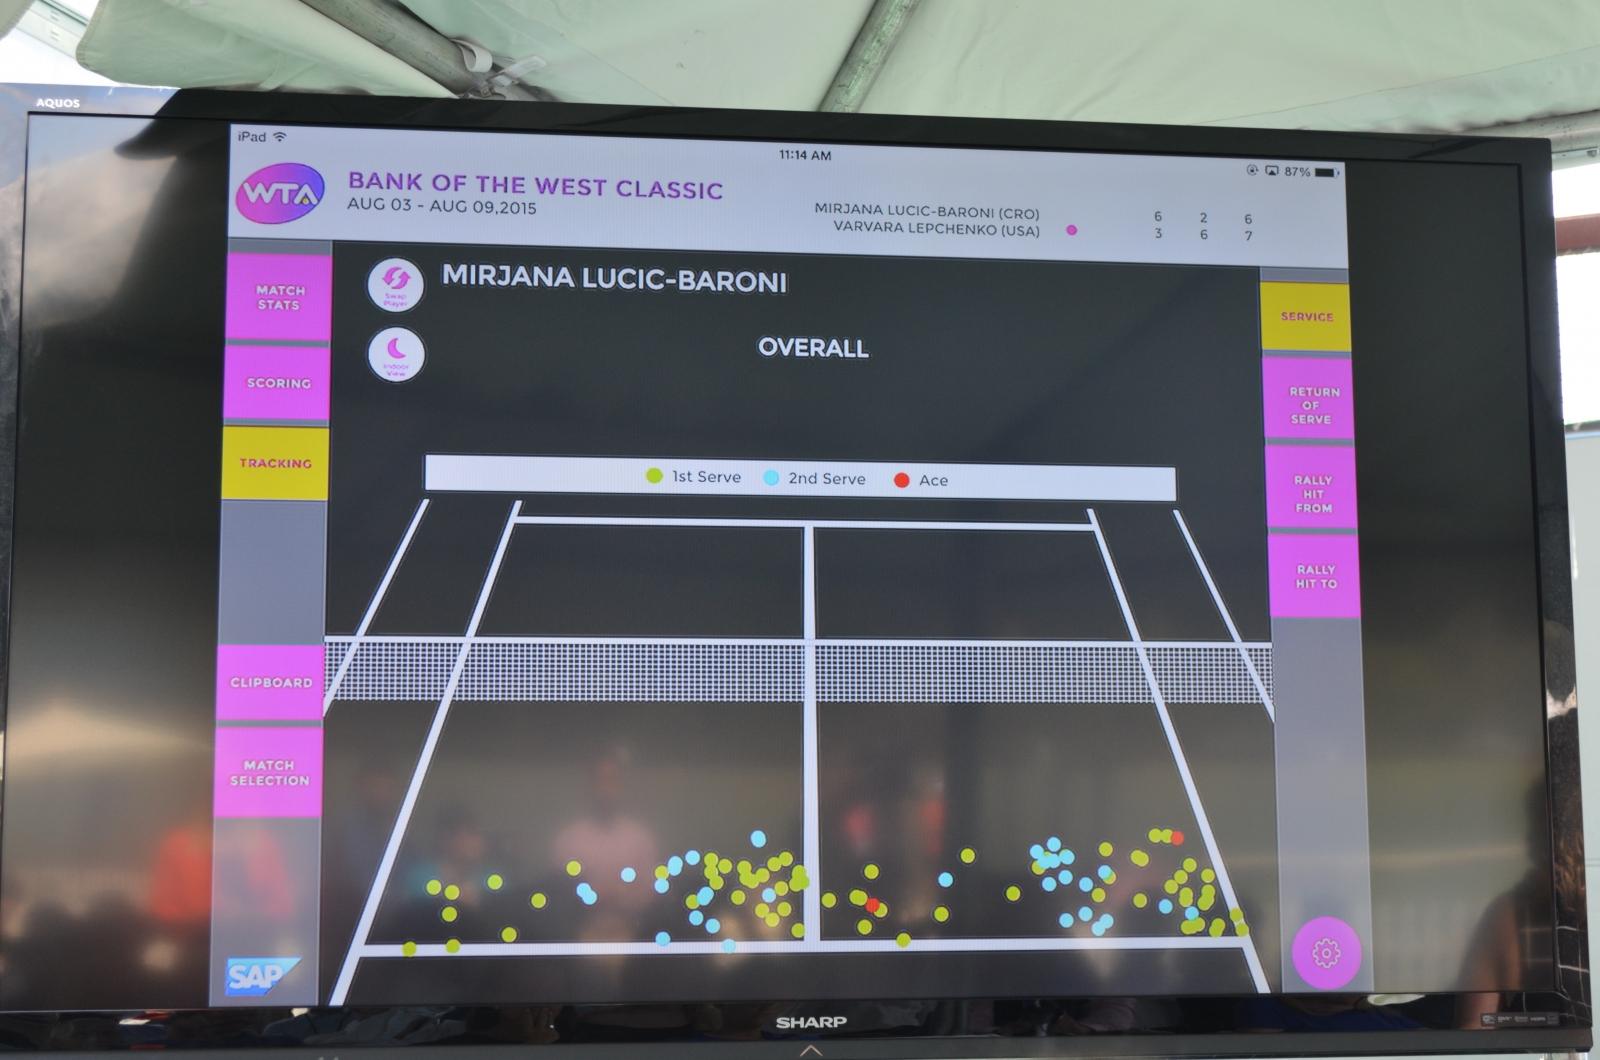 SAP Tennis Analytics iPad app